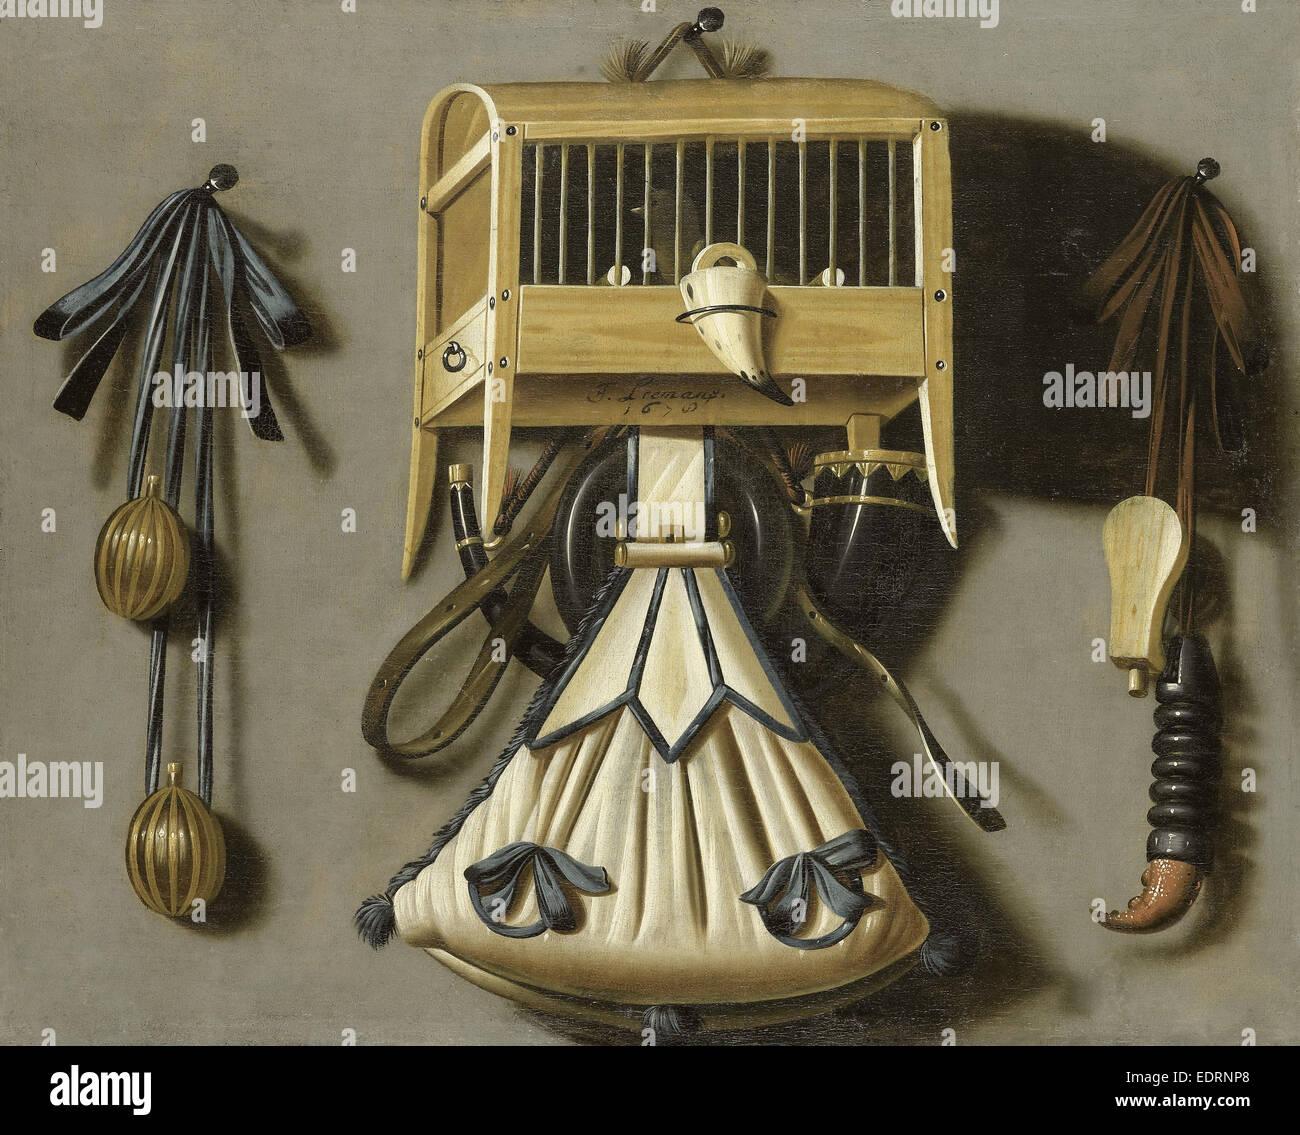 La vie toujours avec la chasse s'attaquer, Johannes Leemans, 1678 Photo Stock